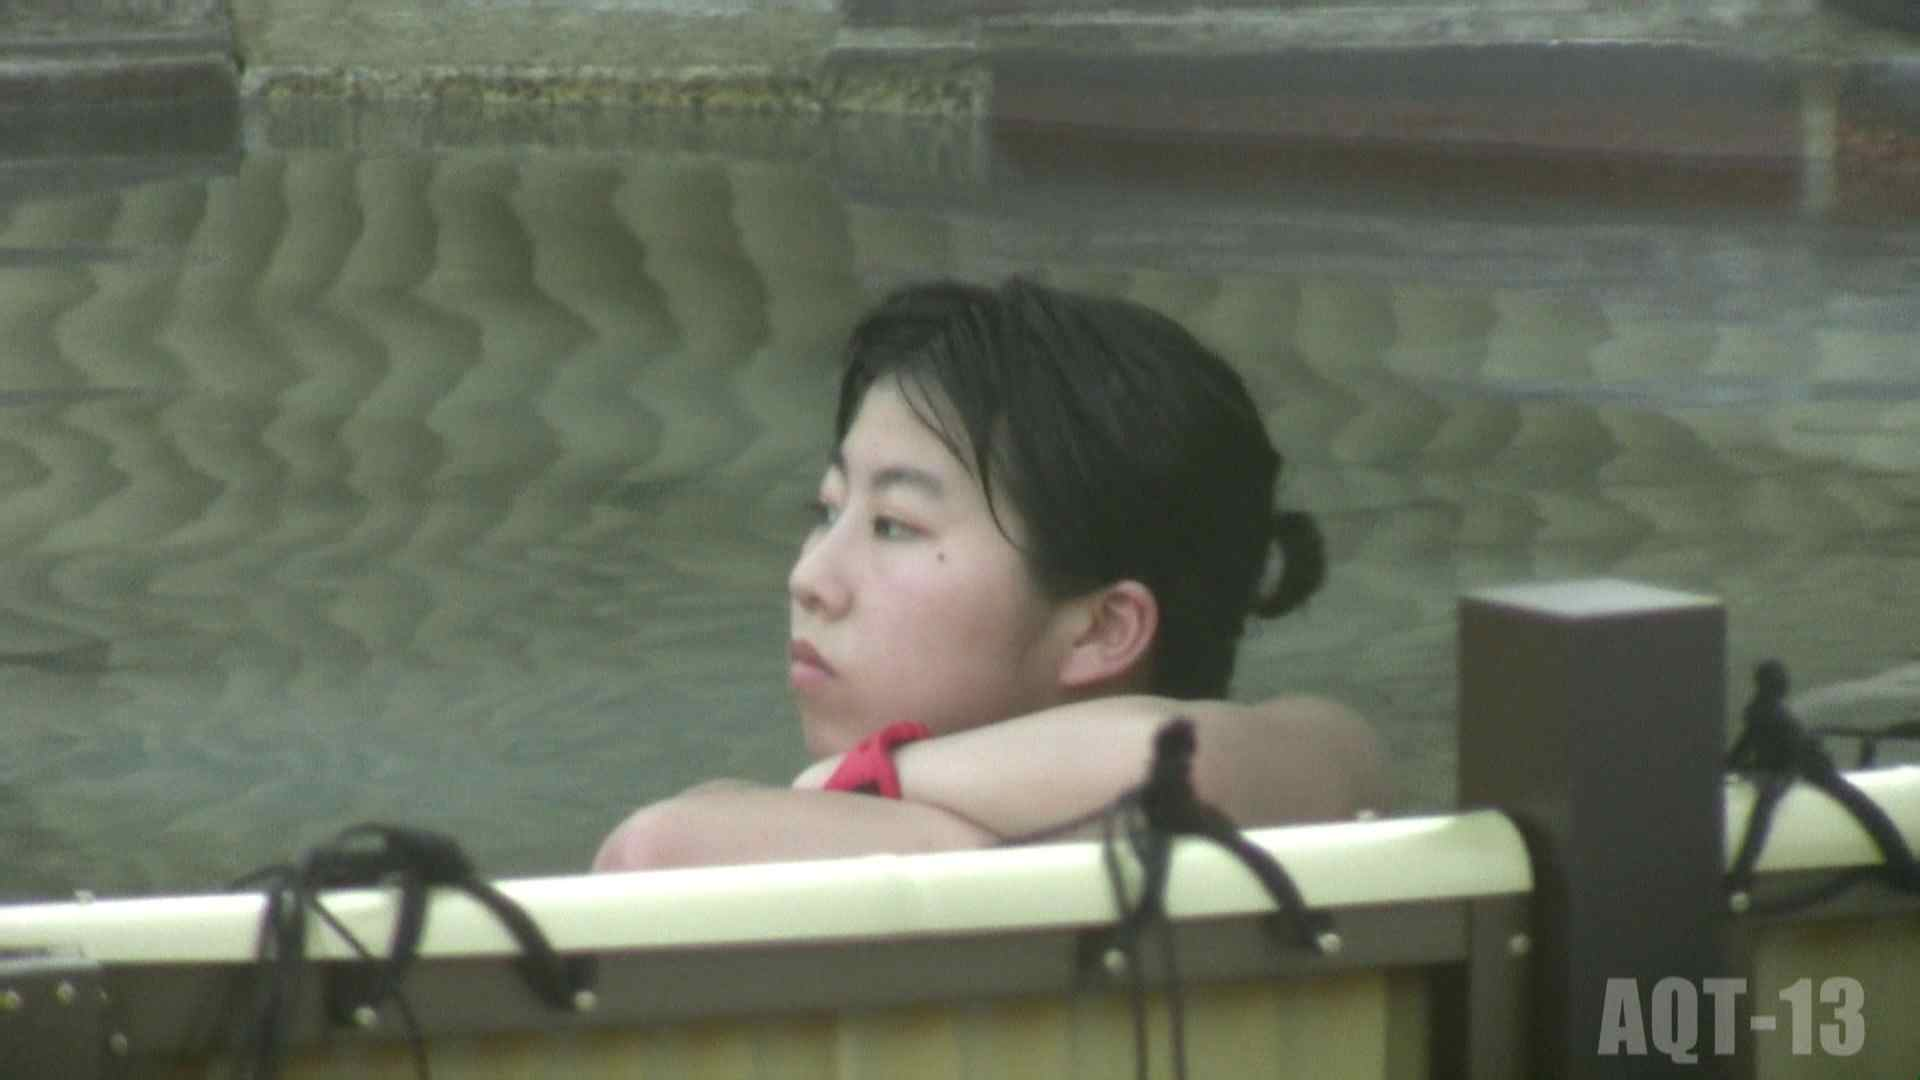 Aquaな露天風呂Vol.816 盗撮 オマンコ無修正動画無料 80画像 50